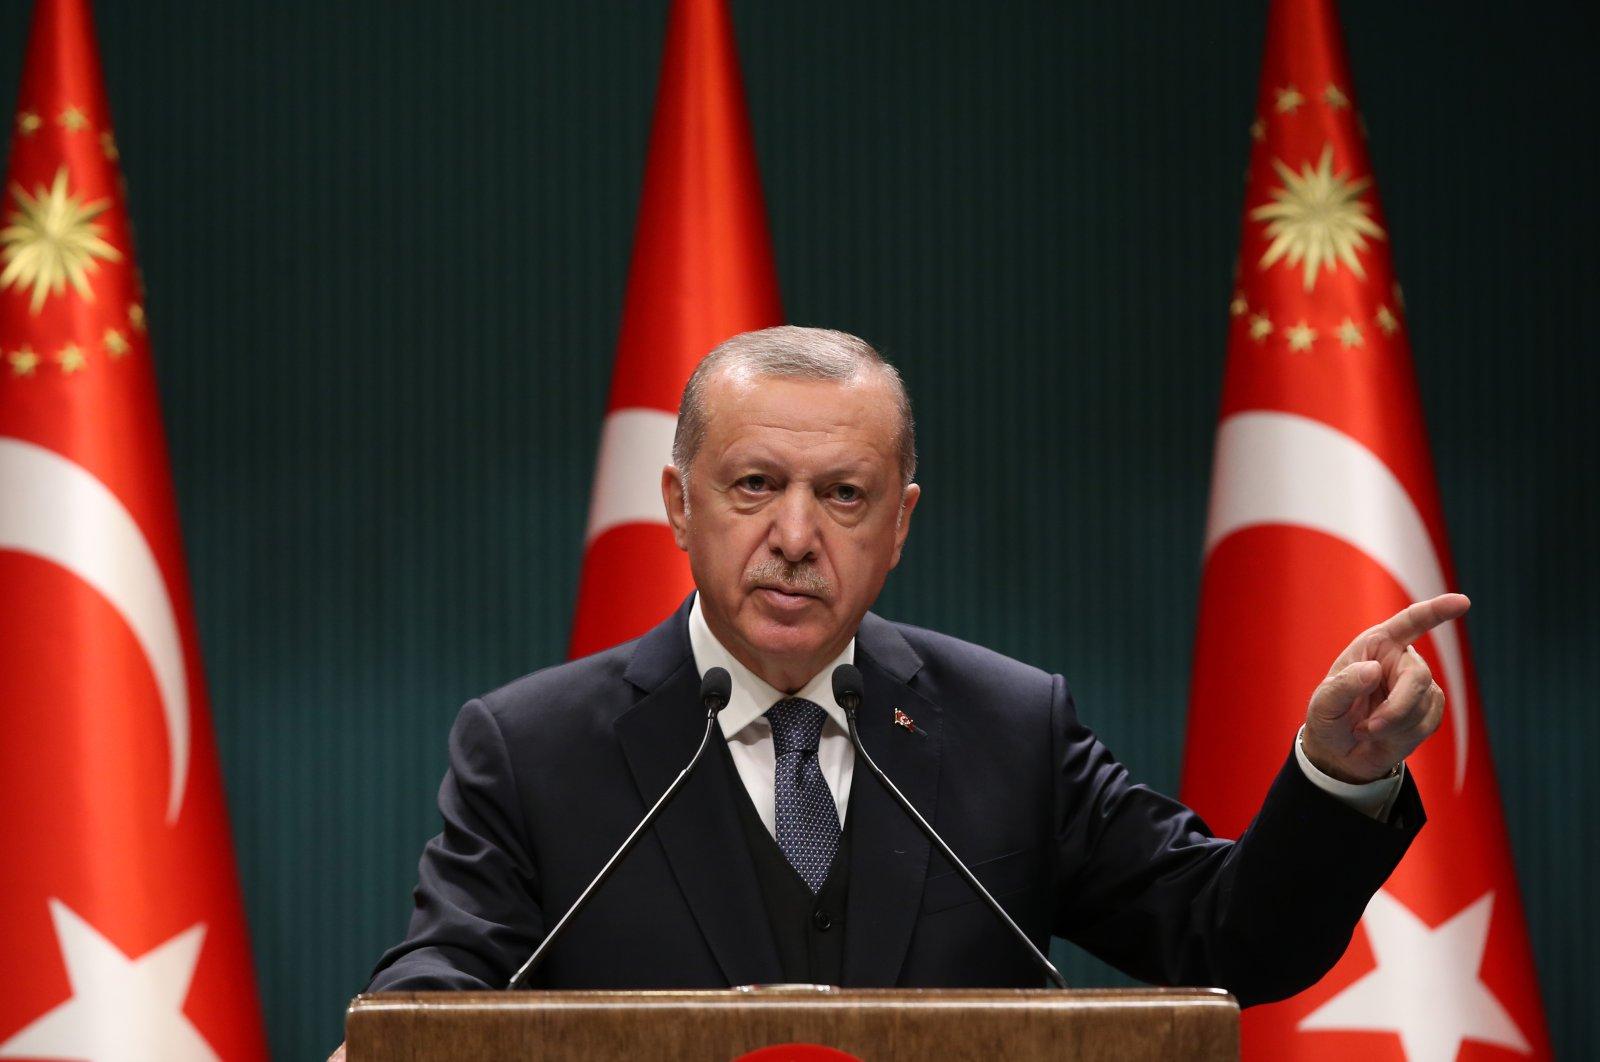 President Recep Tayyip Erdoğan speaks to press members after chairing a cabinet meeting, Ankara, July 14, 2020. (AA Photo)